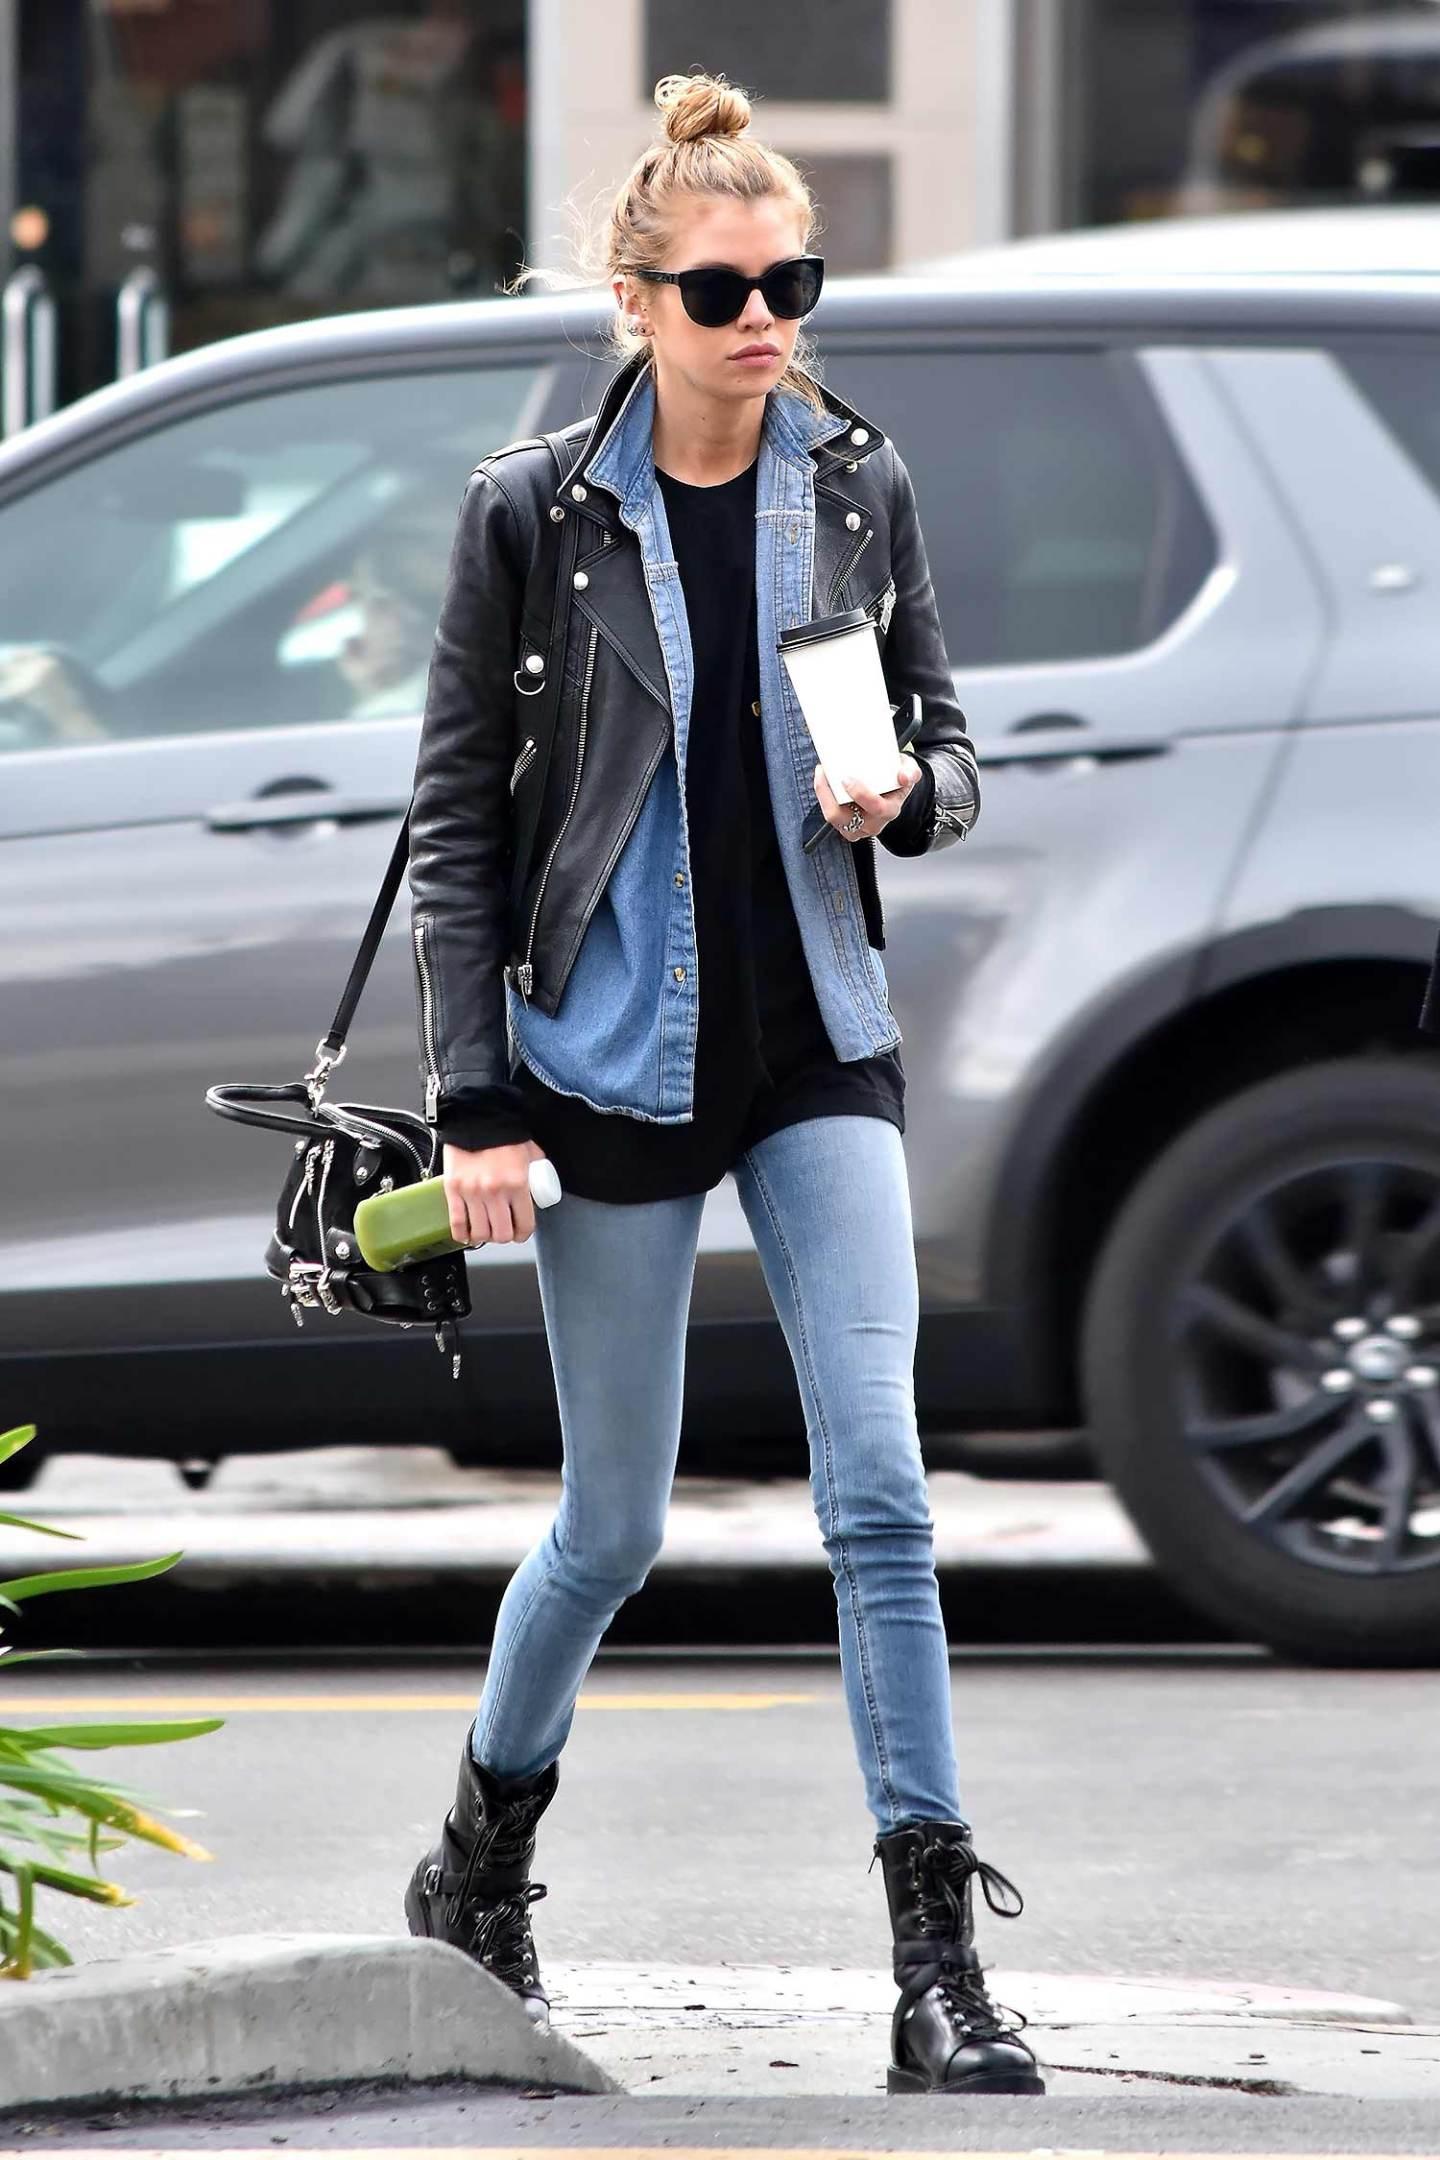 stella-maxwell-double-denim-shirt-leather-jacket